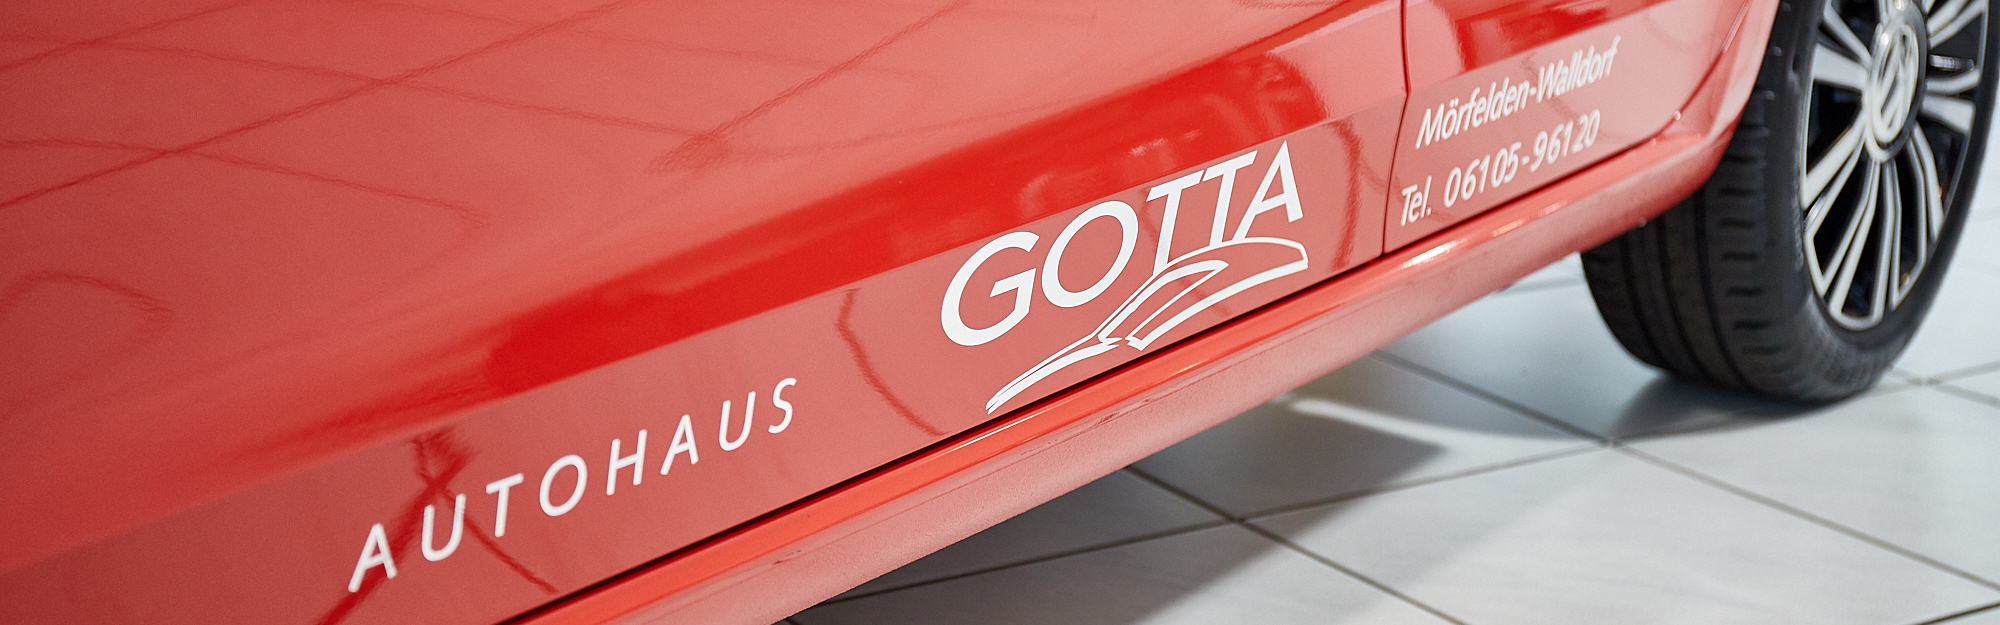 170727-Gotta-Autohaus-017